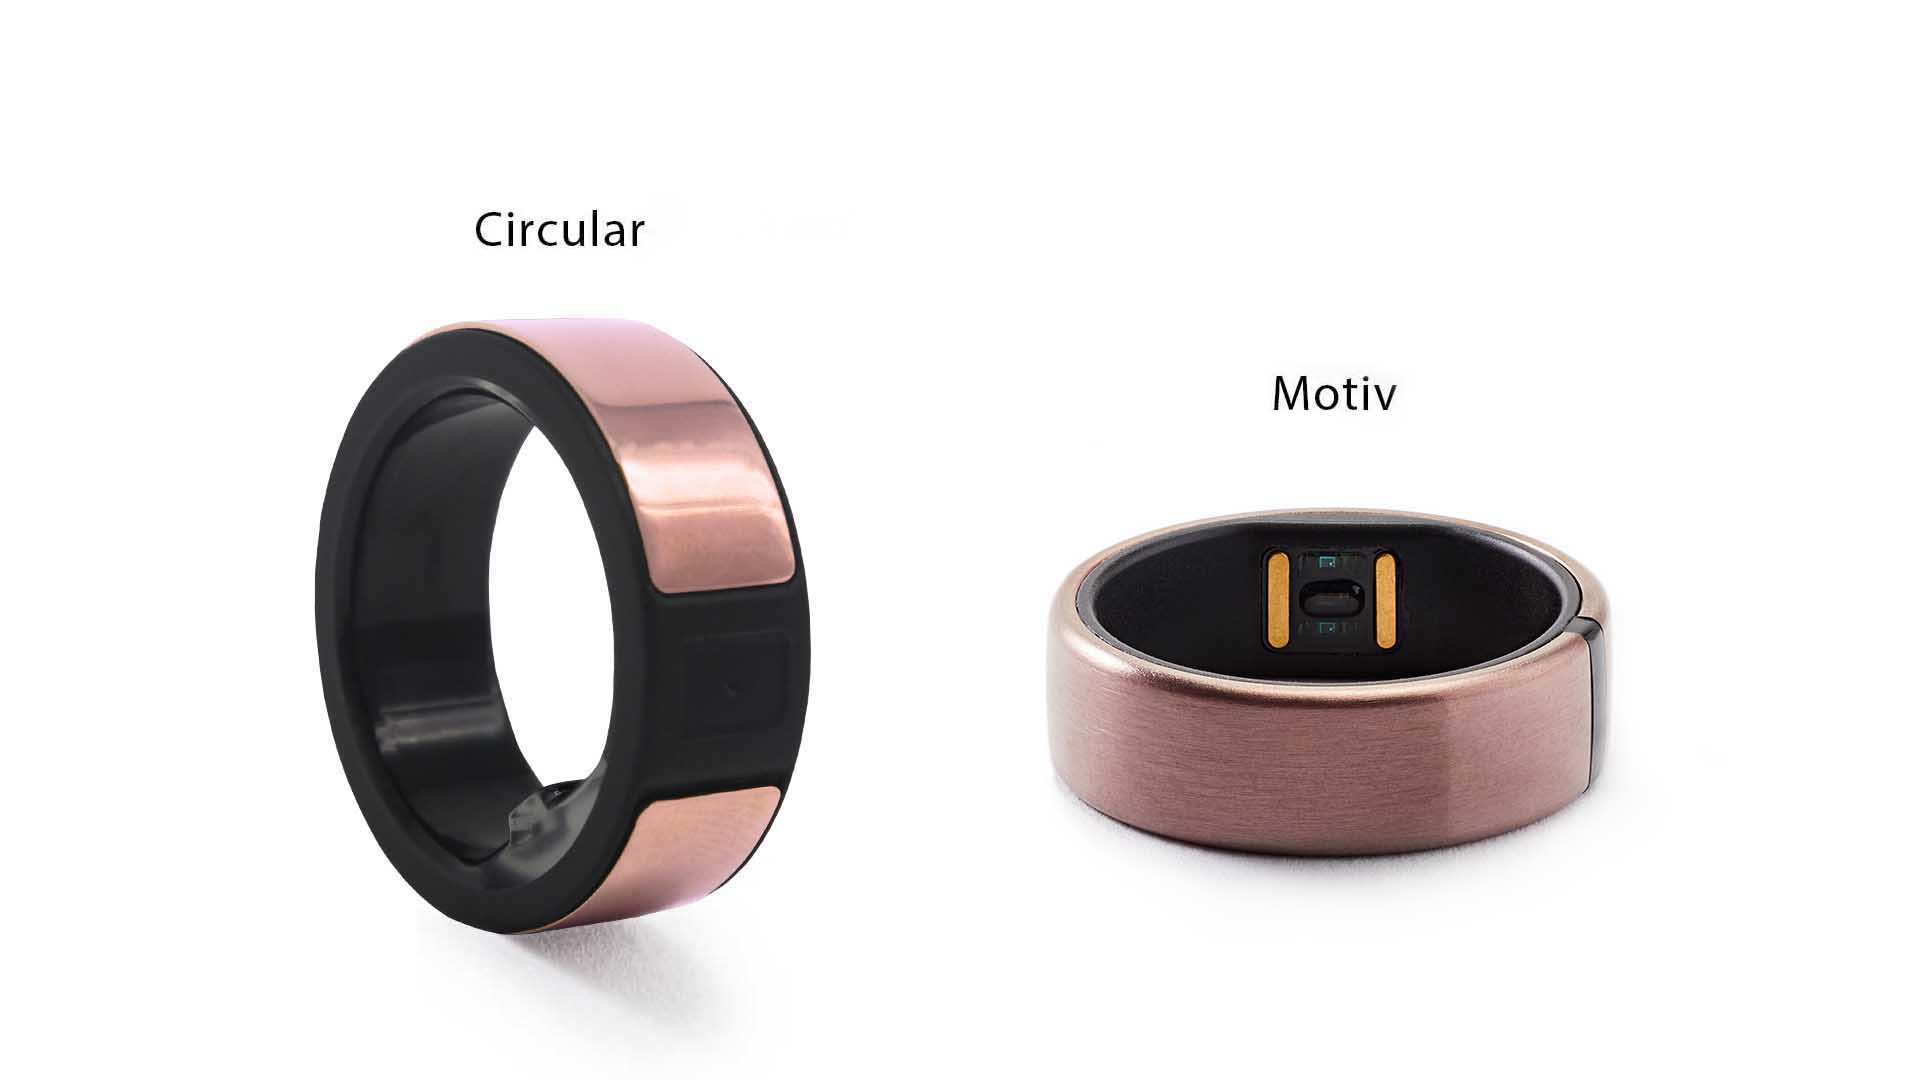 Circular and Motiv smart rings